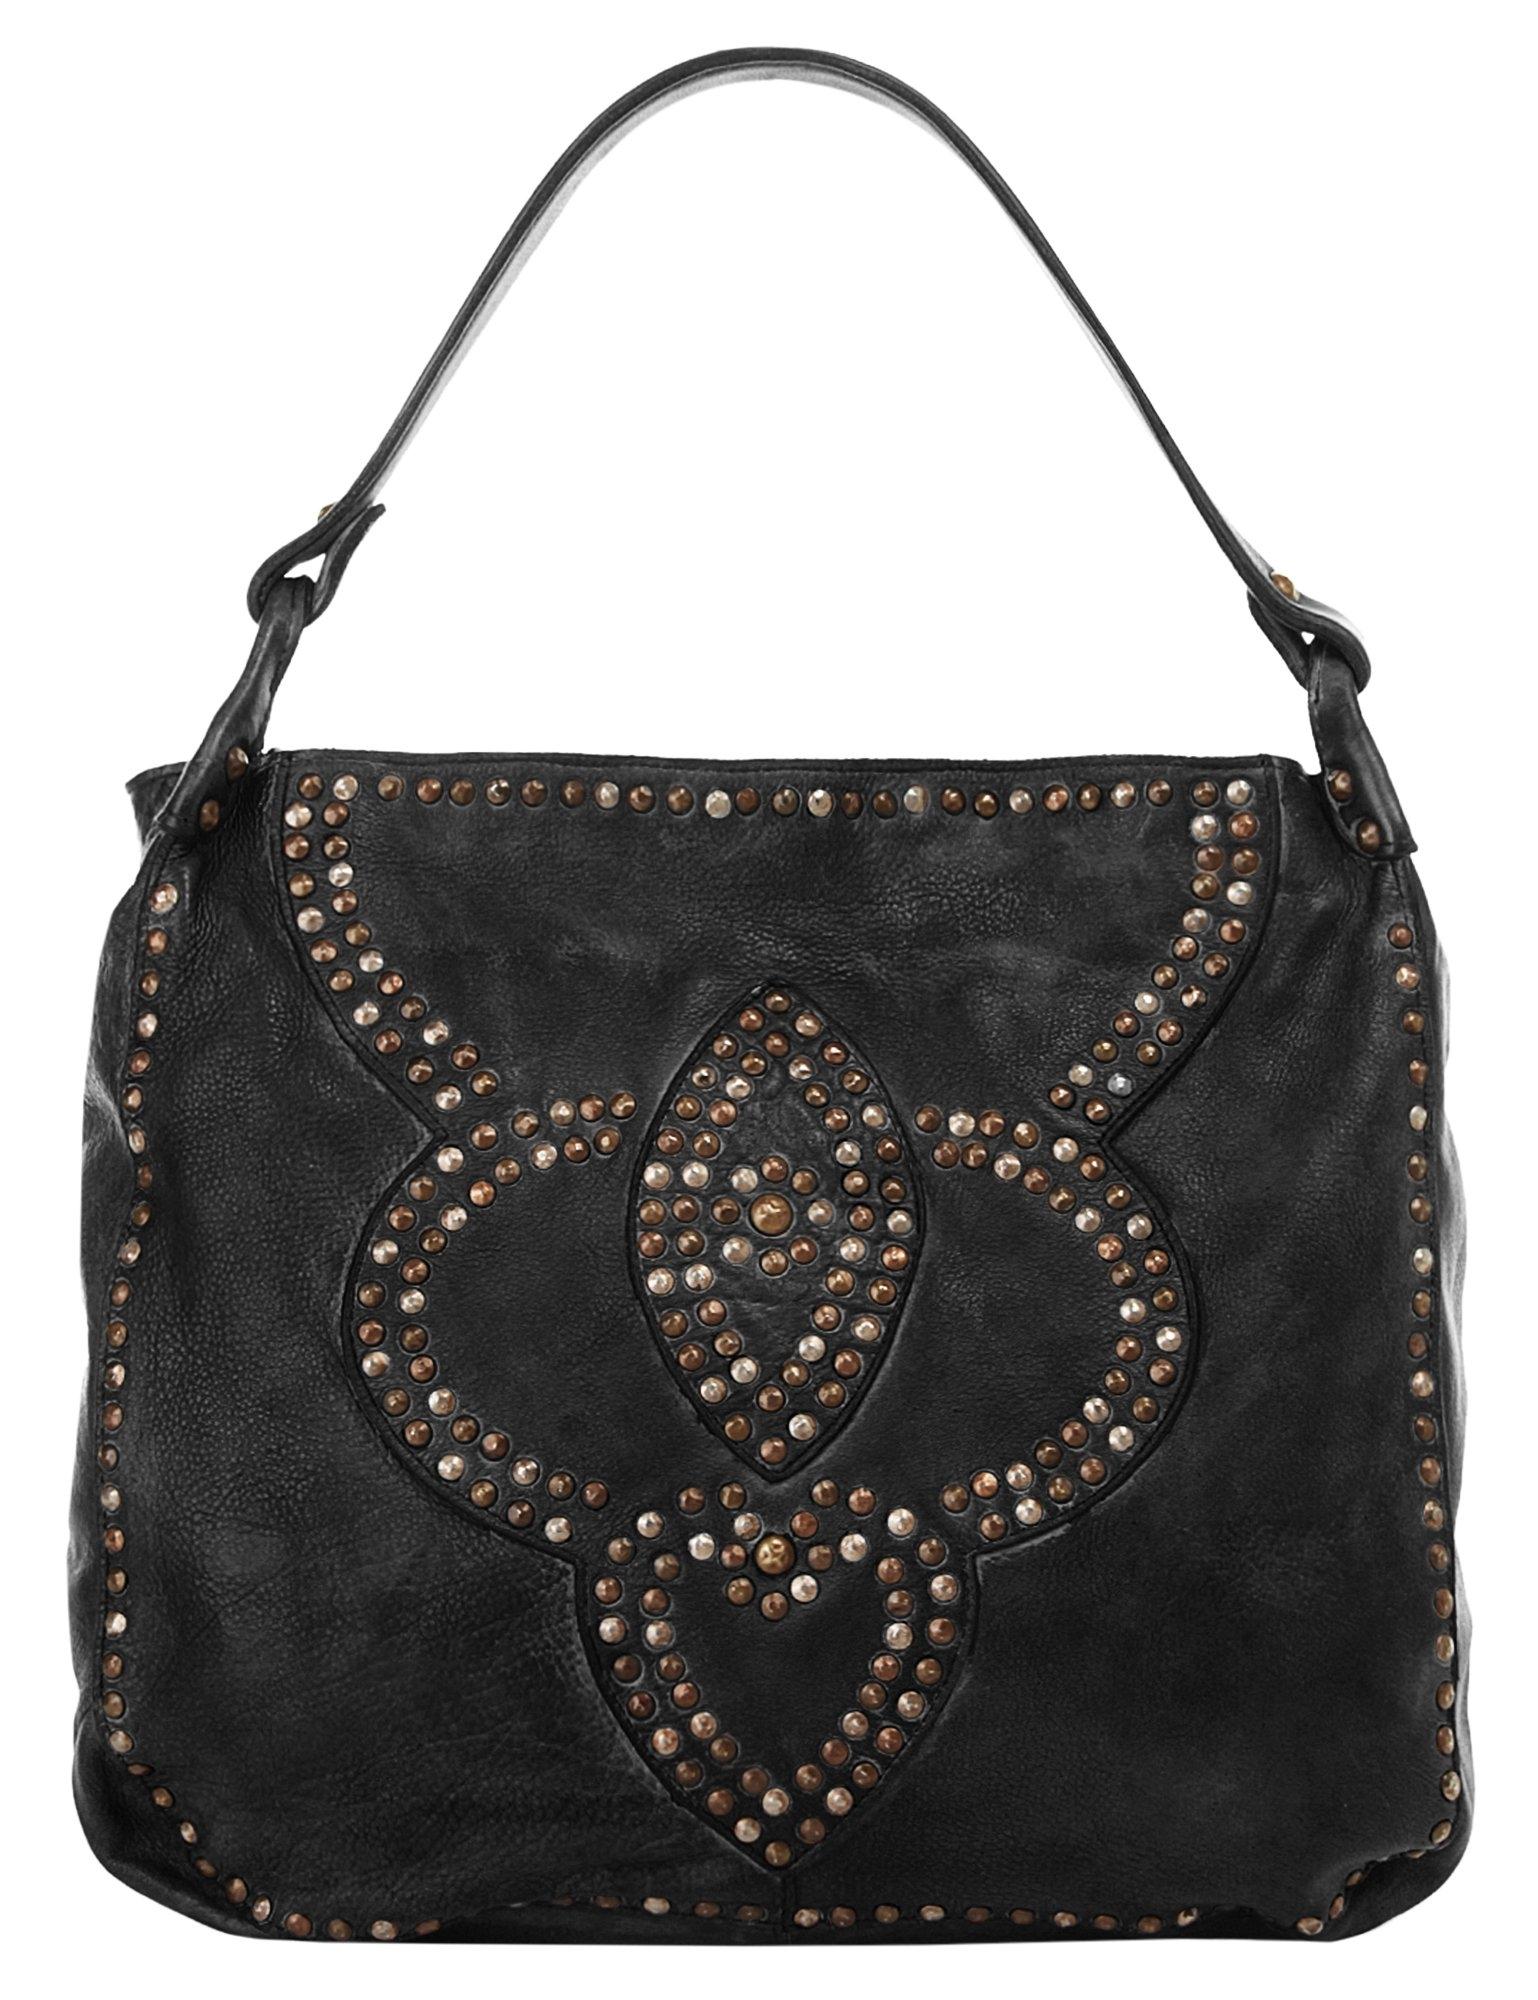 Samantha Look shopper nu online kopen bij OTTO